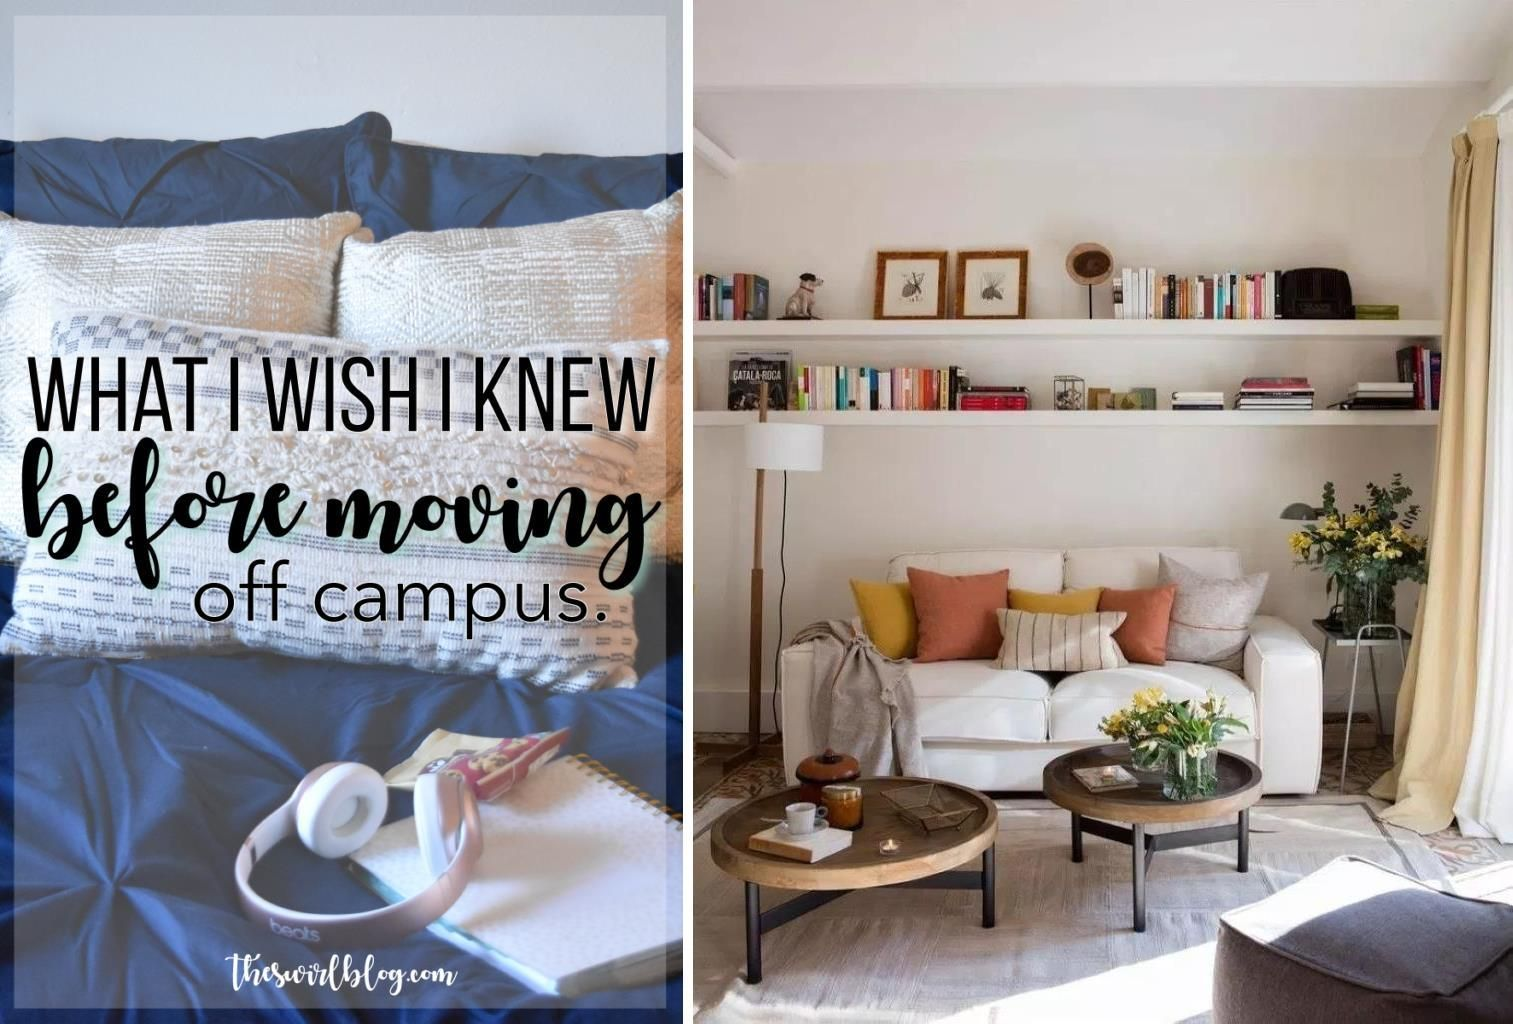 Cheap Interior Design Ideas Cheap Room Ideas Low Budget Interior Design Ideas For Living Room With Images Cheap Interior Design Affordable Home Decor